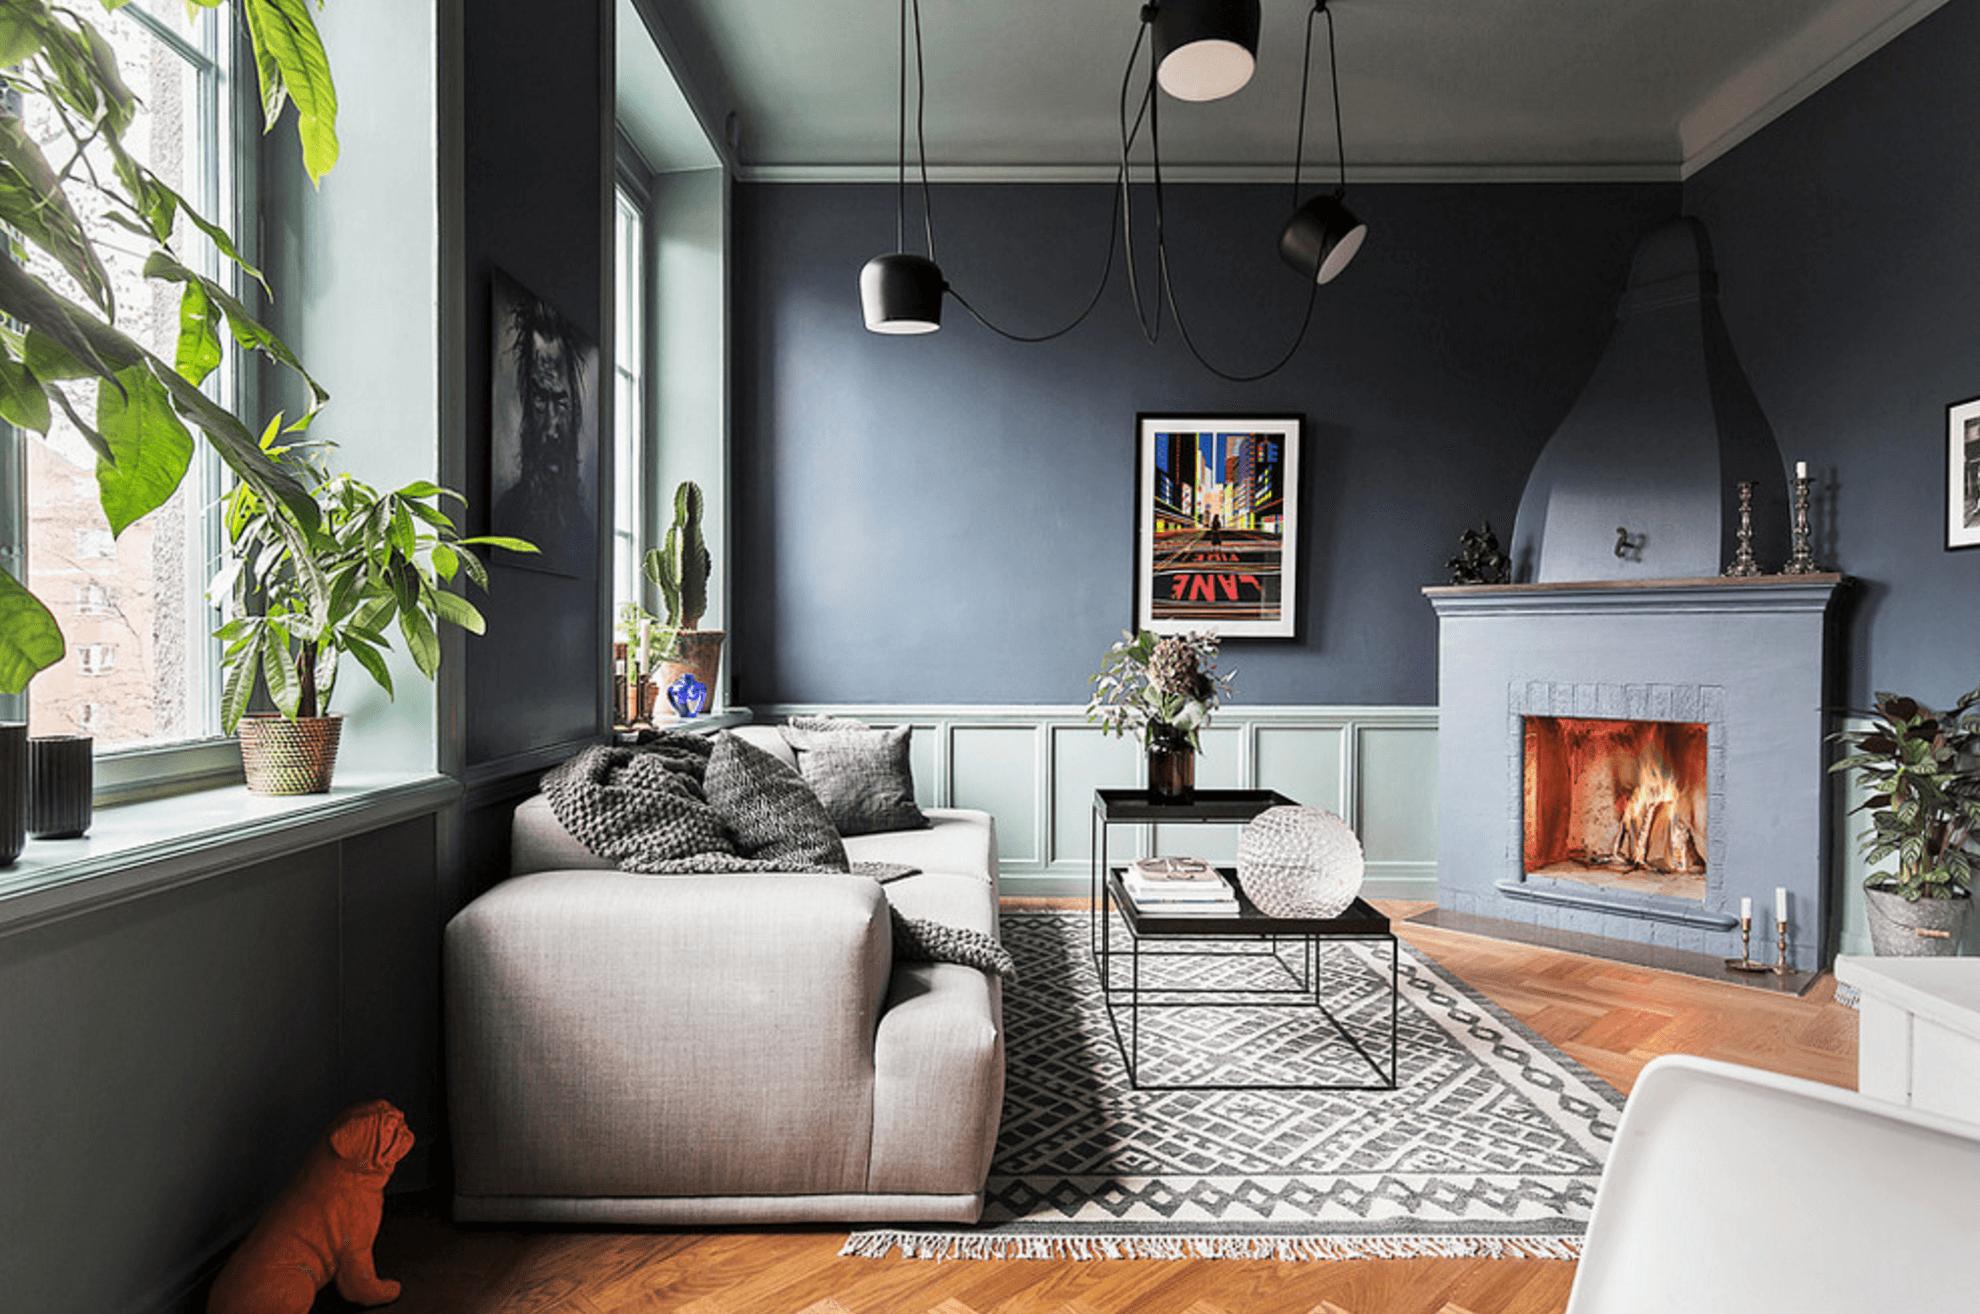 Principles Of Scandinavian Interior Design Living Room Scandinavian Scandinavian Interior Design Apartment Interior Design